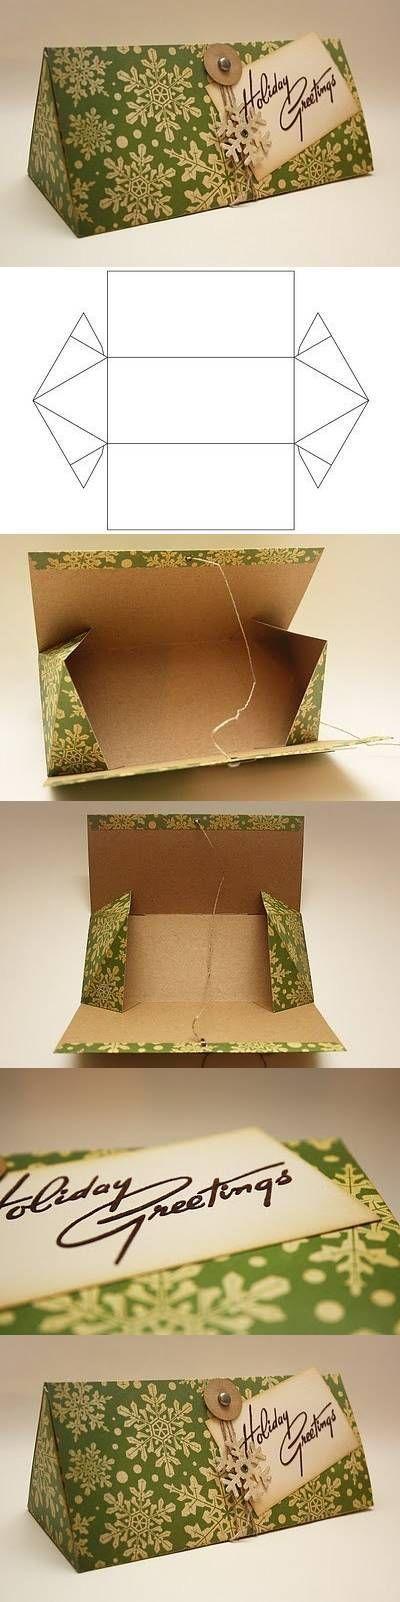 DIY Long Gift Box DIY Projects / UsefulDIY.com